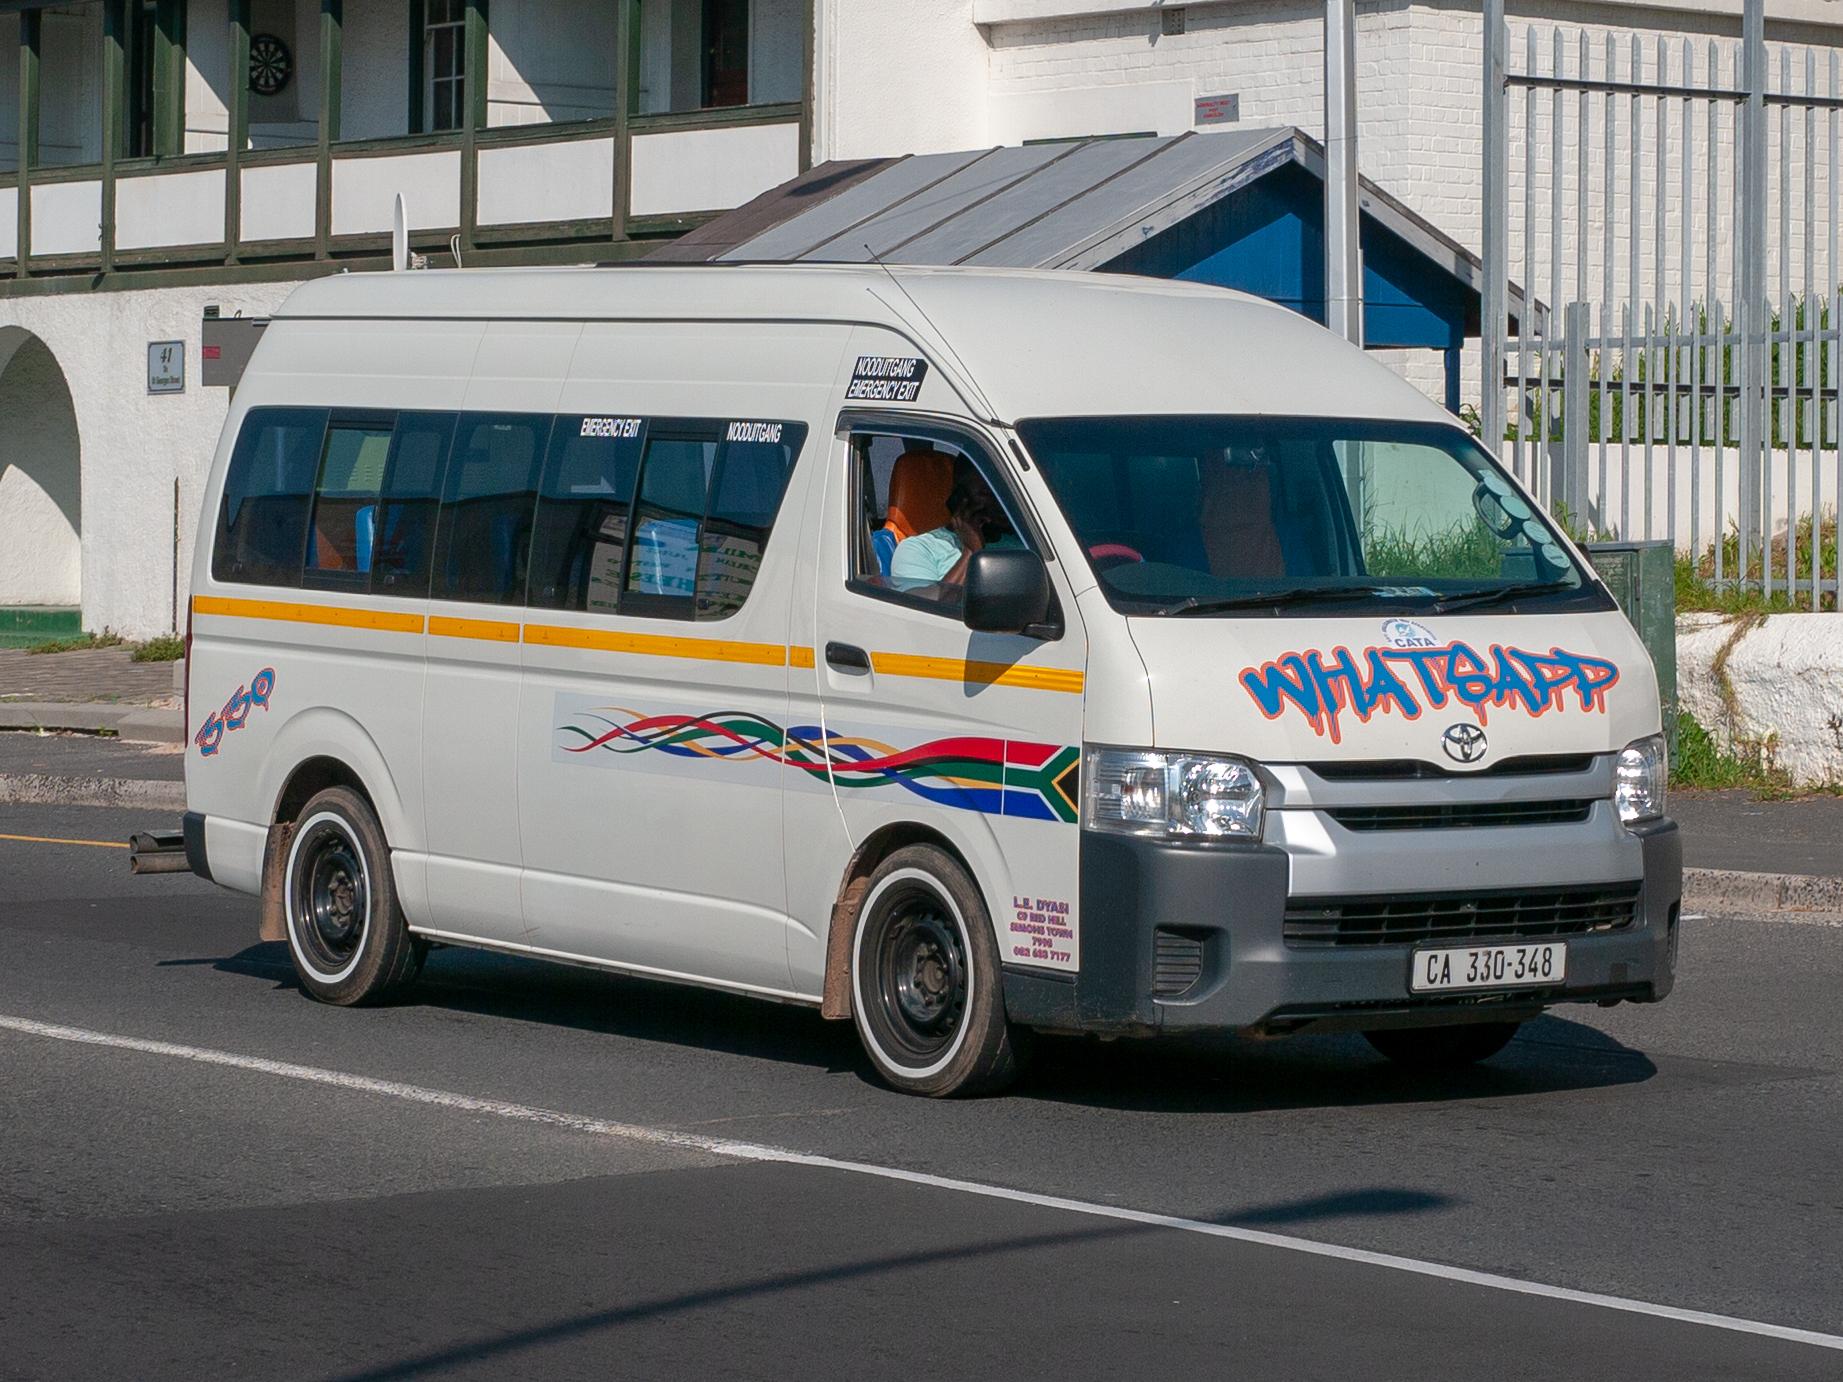 [Imagem: Wikimania_2018%2C_Cape_Town_%28P1050535%29.jpg]